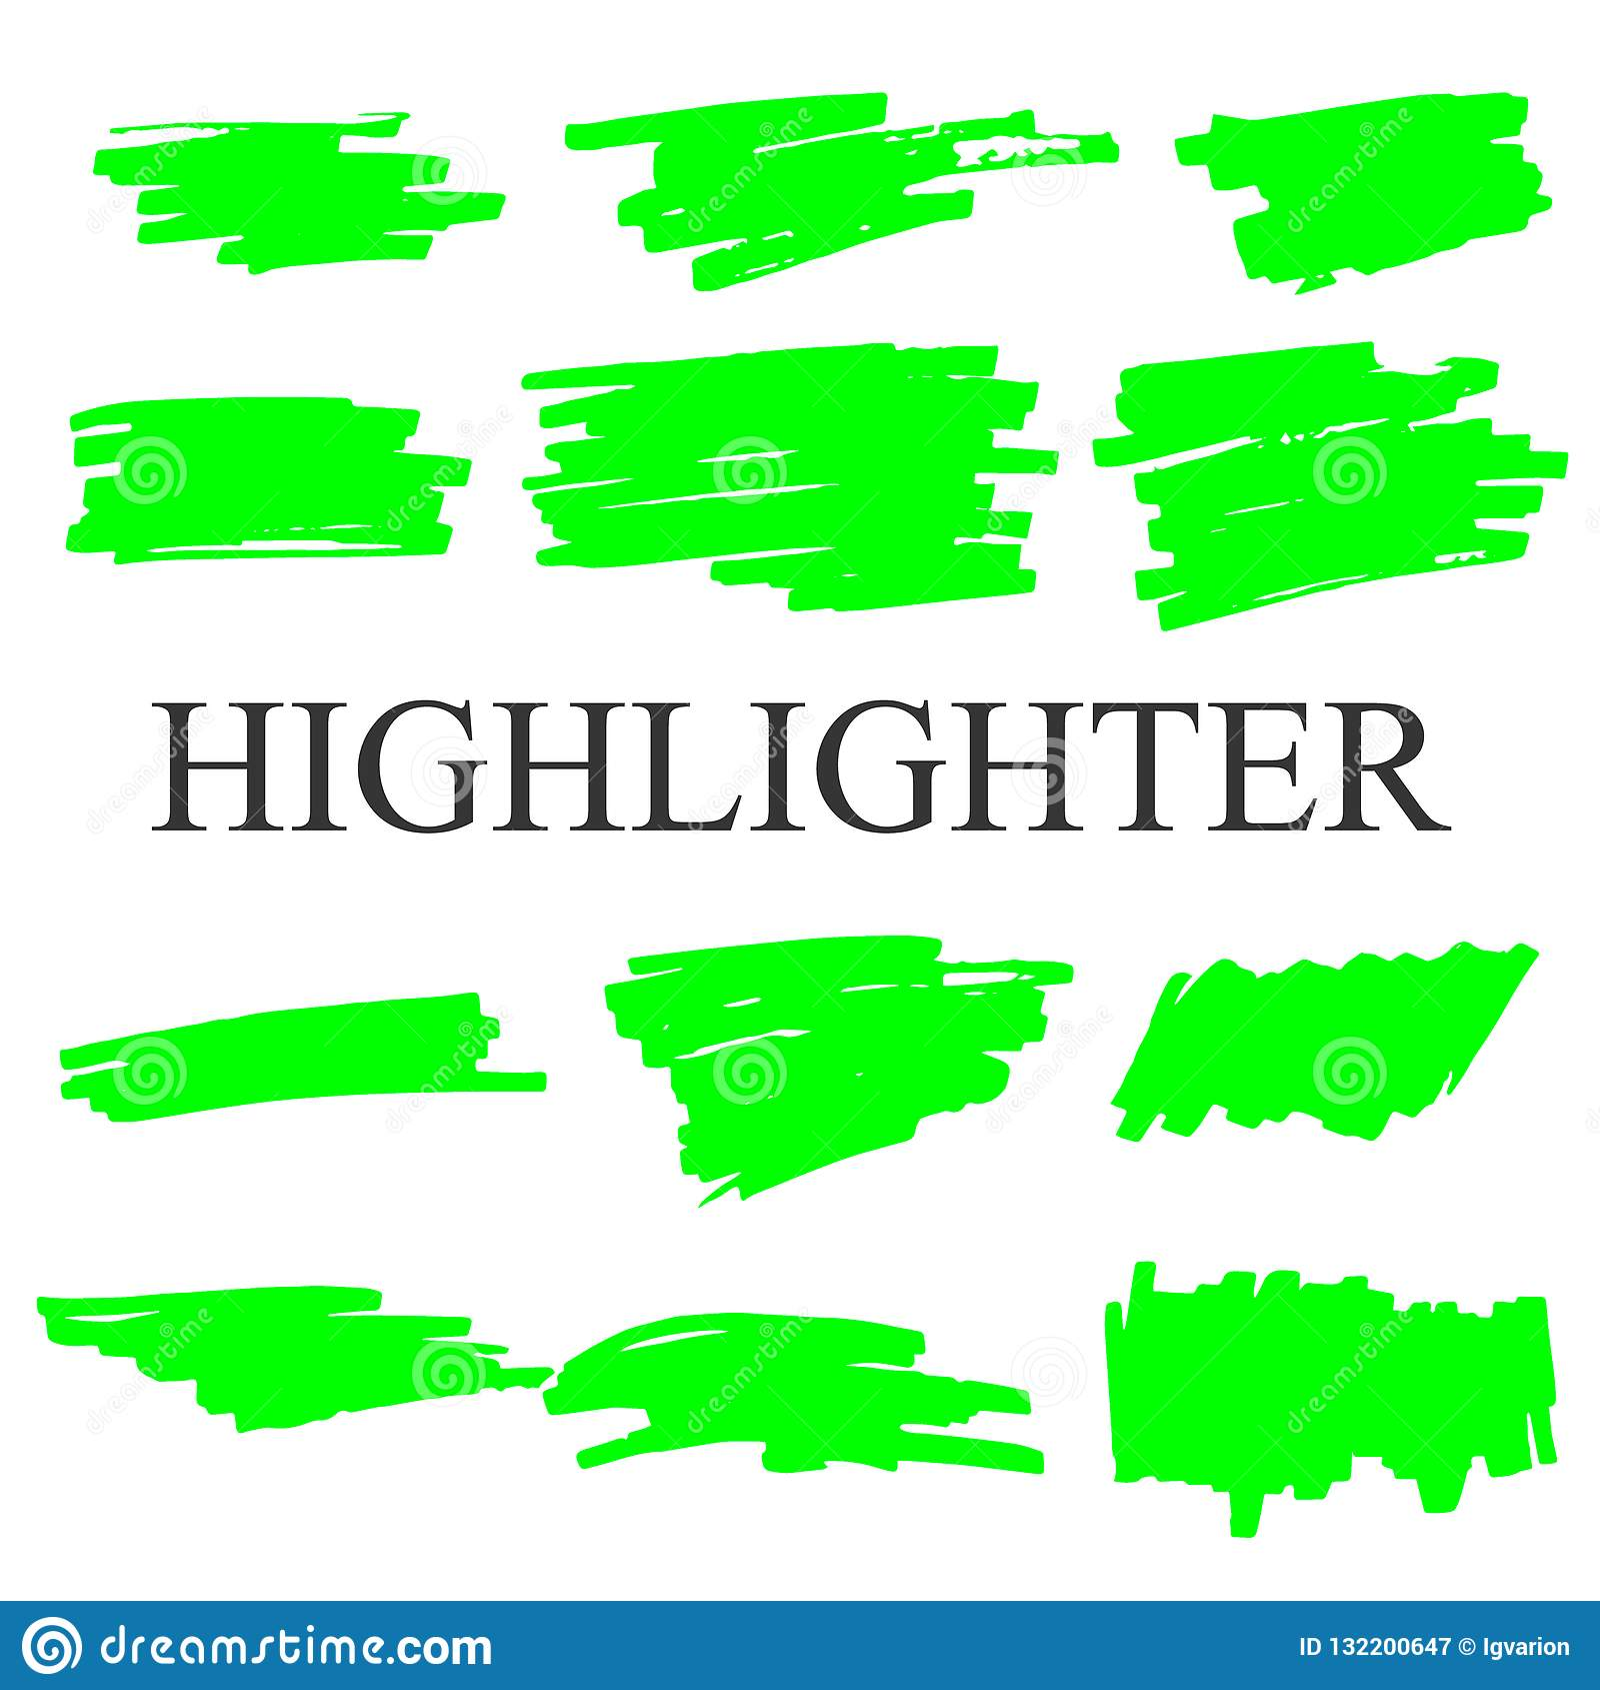 Cursos do highlighter isolados no grupo branco do vetor do fundo